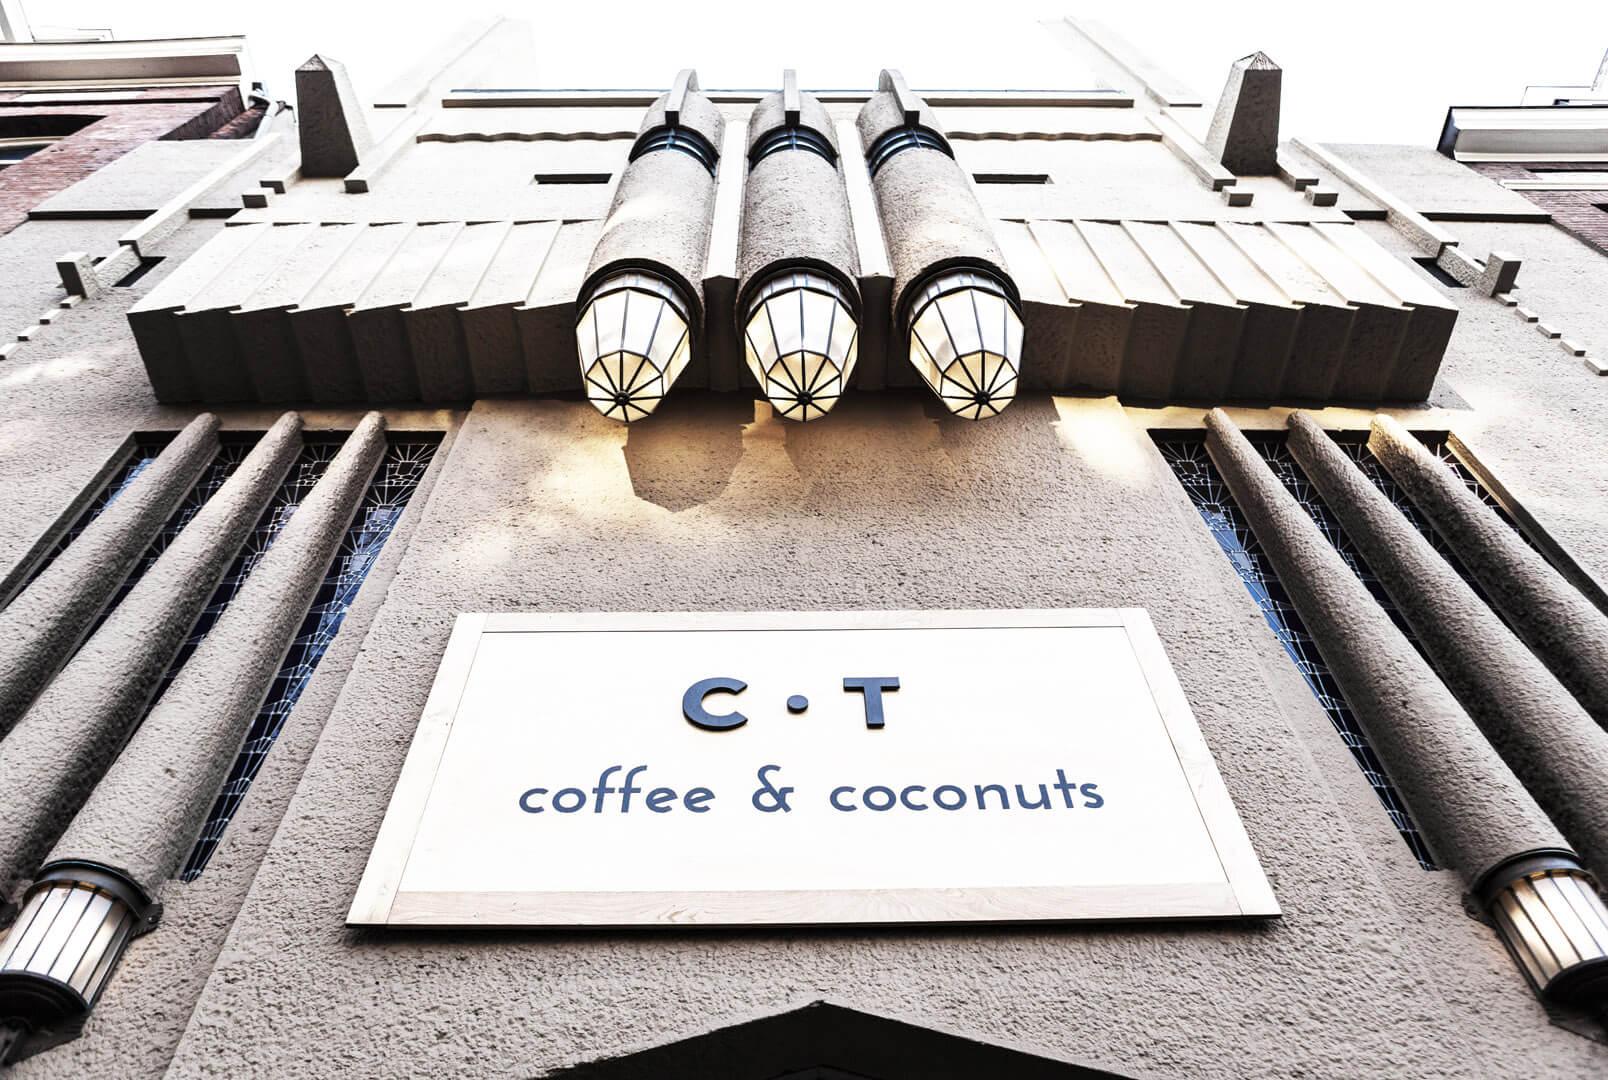 img via Coffee & Coconuts